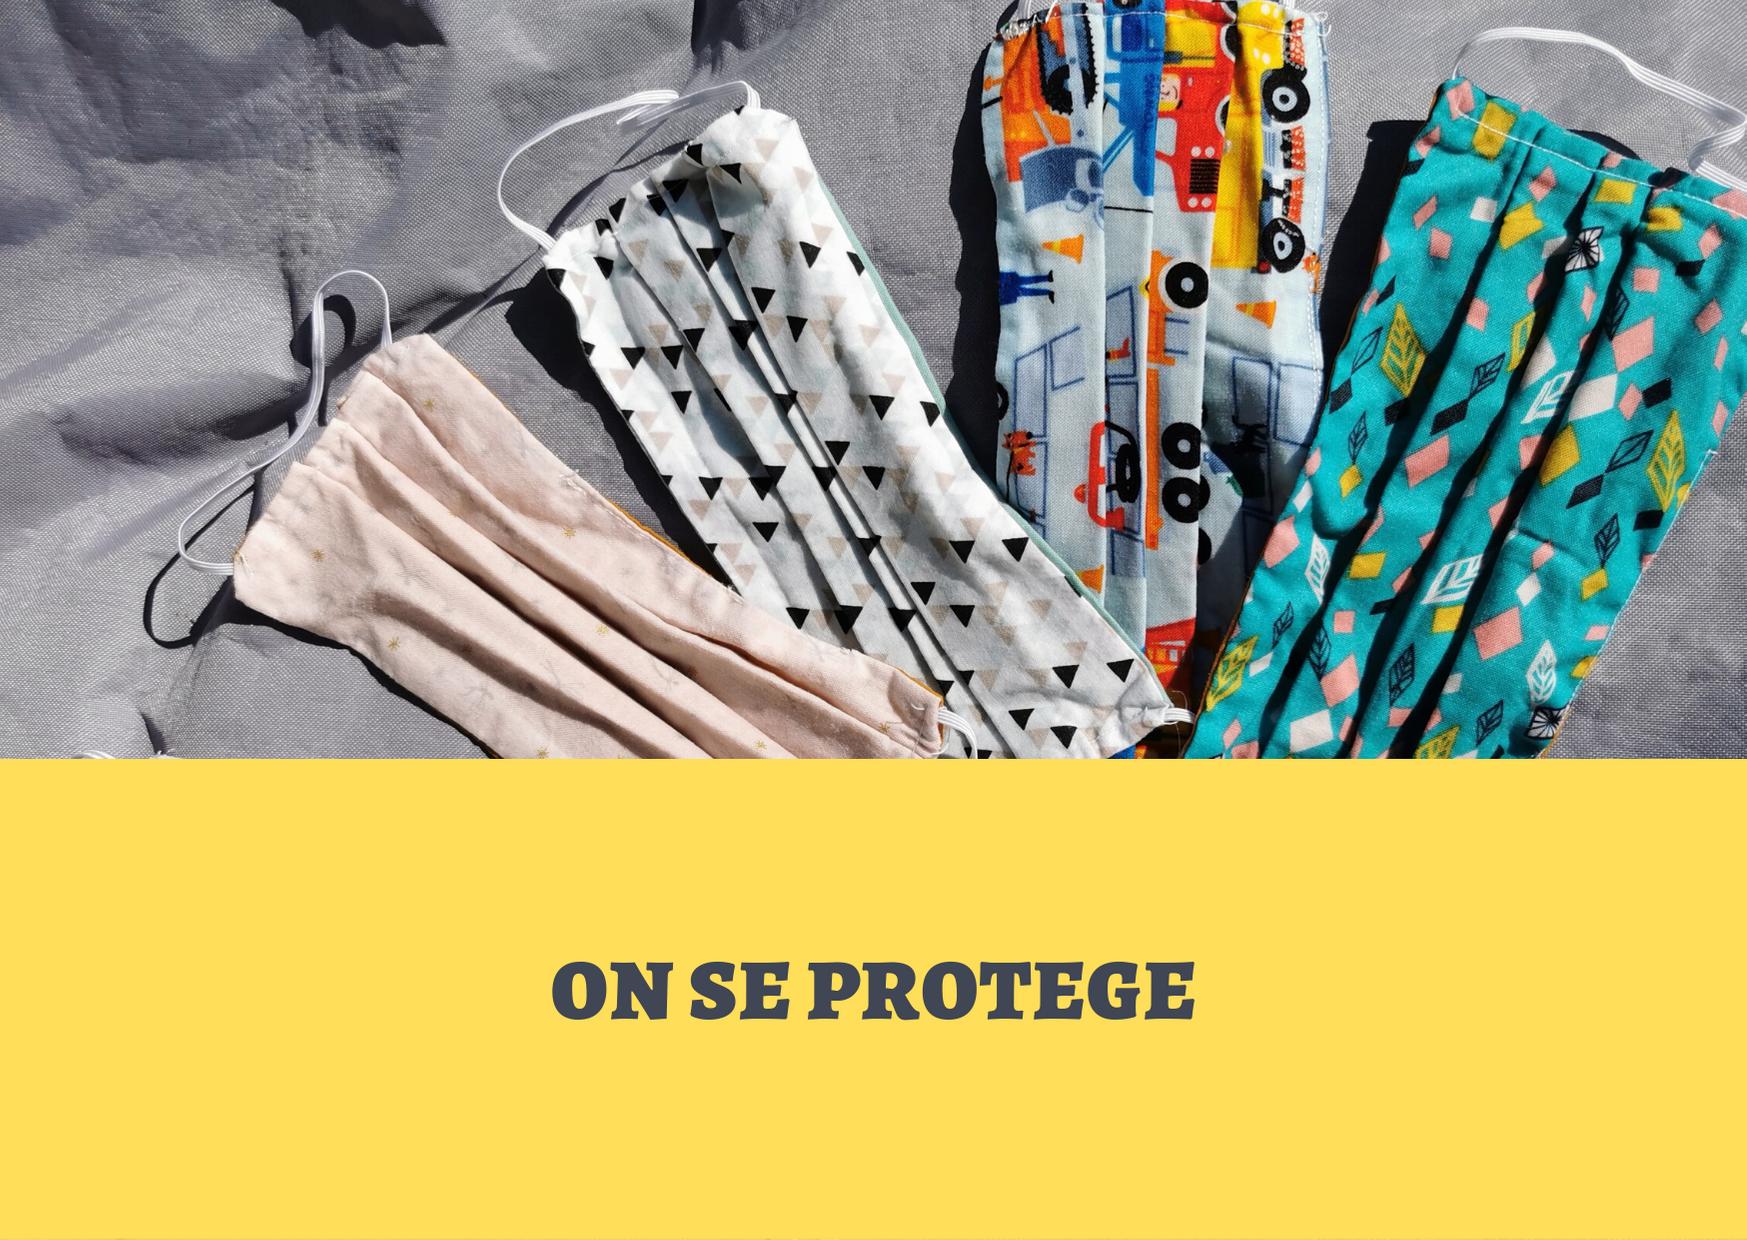 Kit masque de protection en tissu